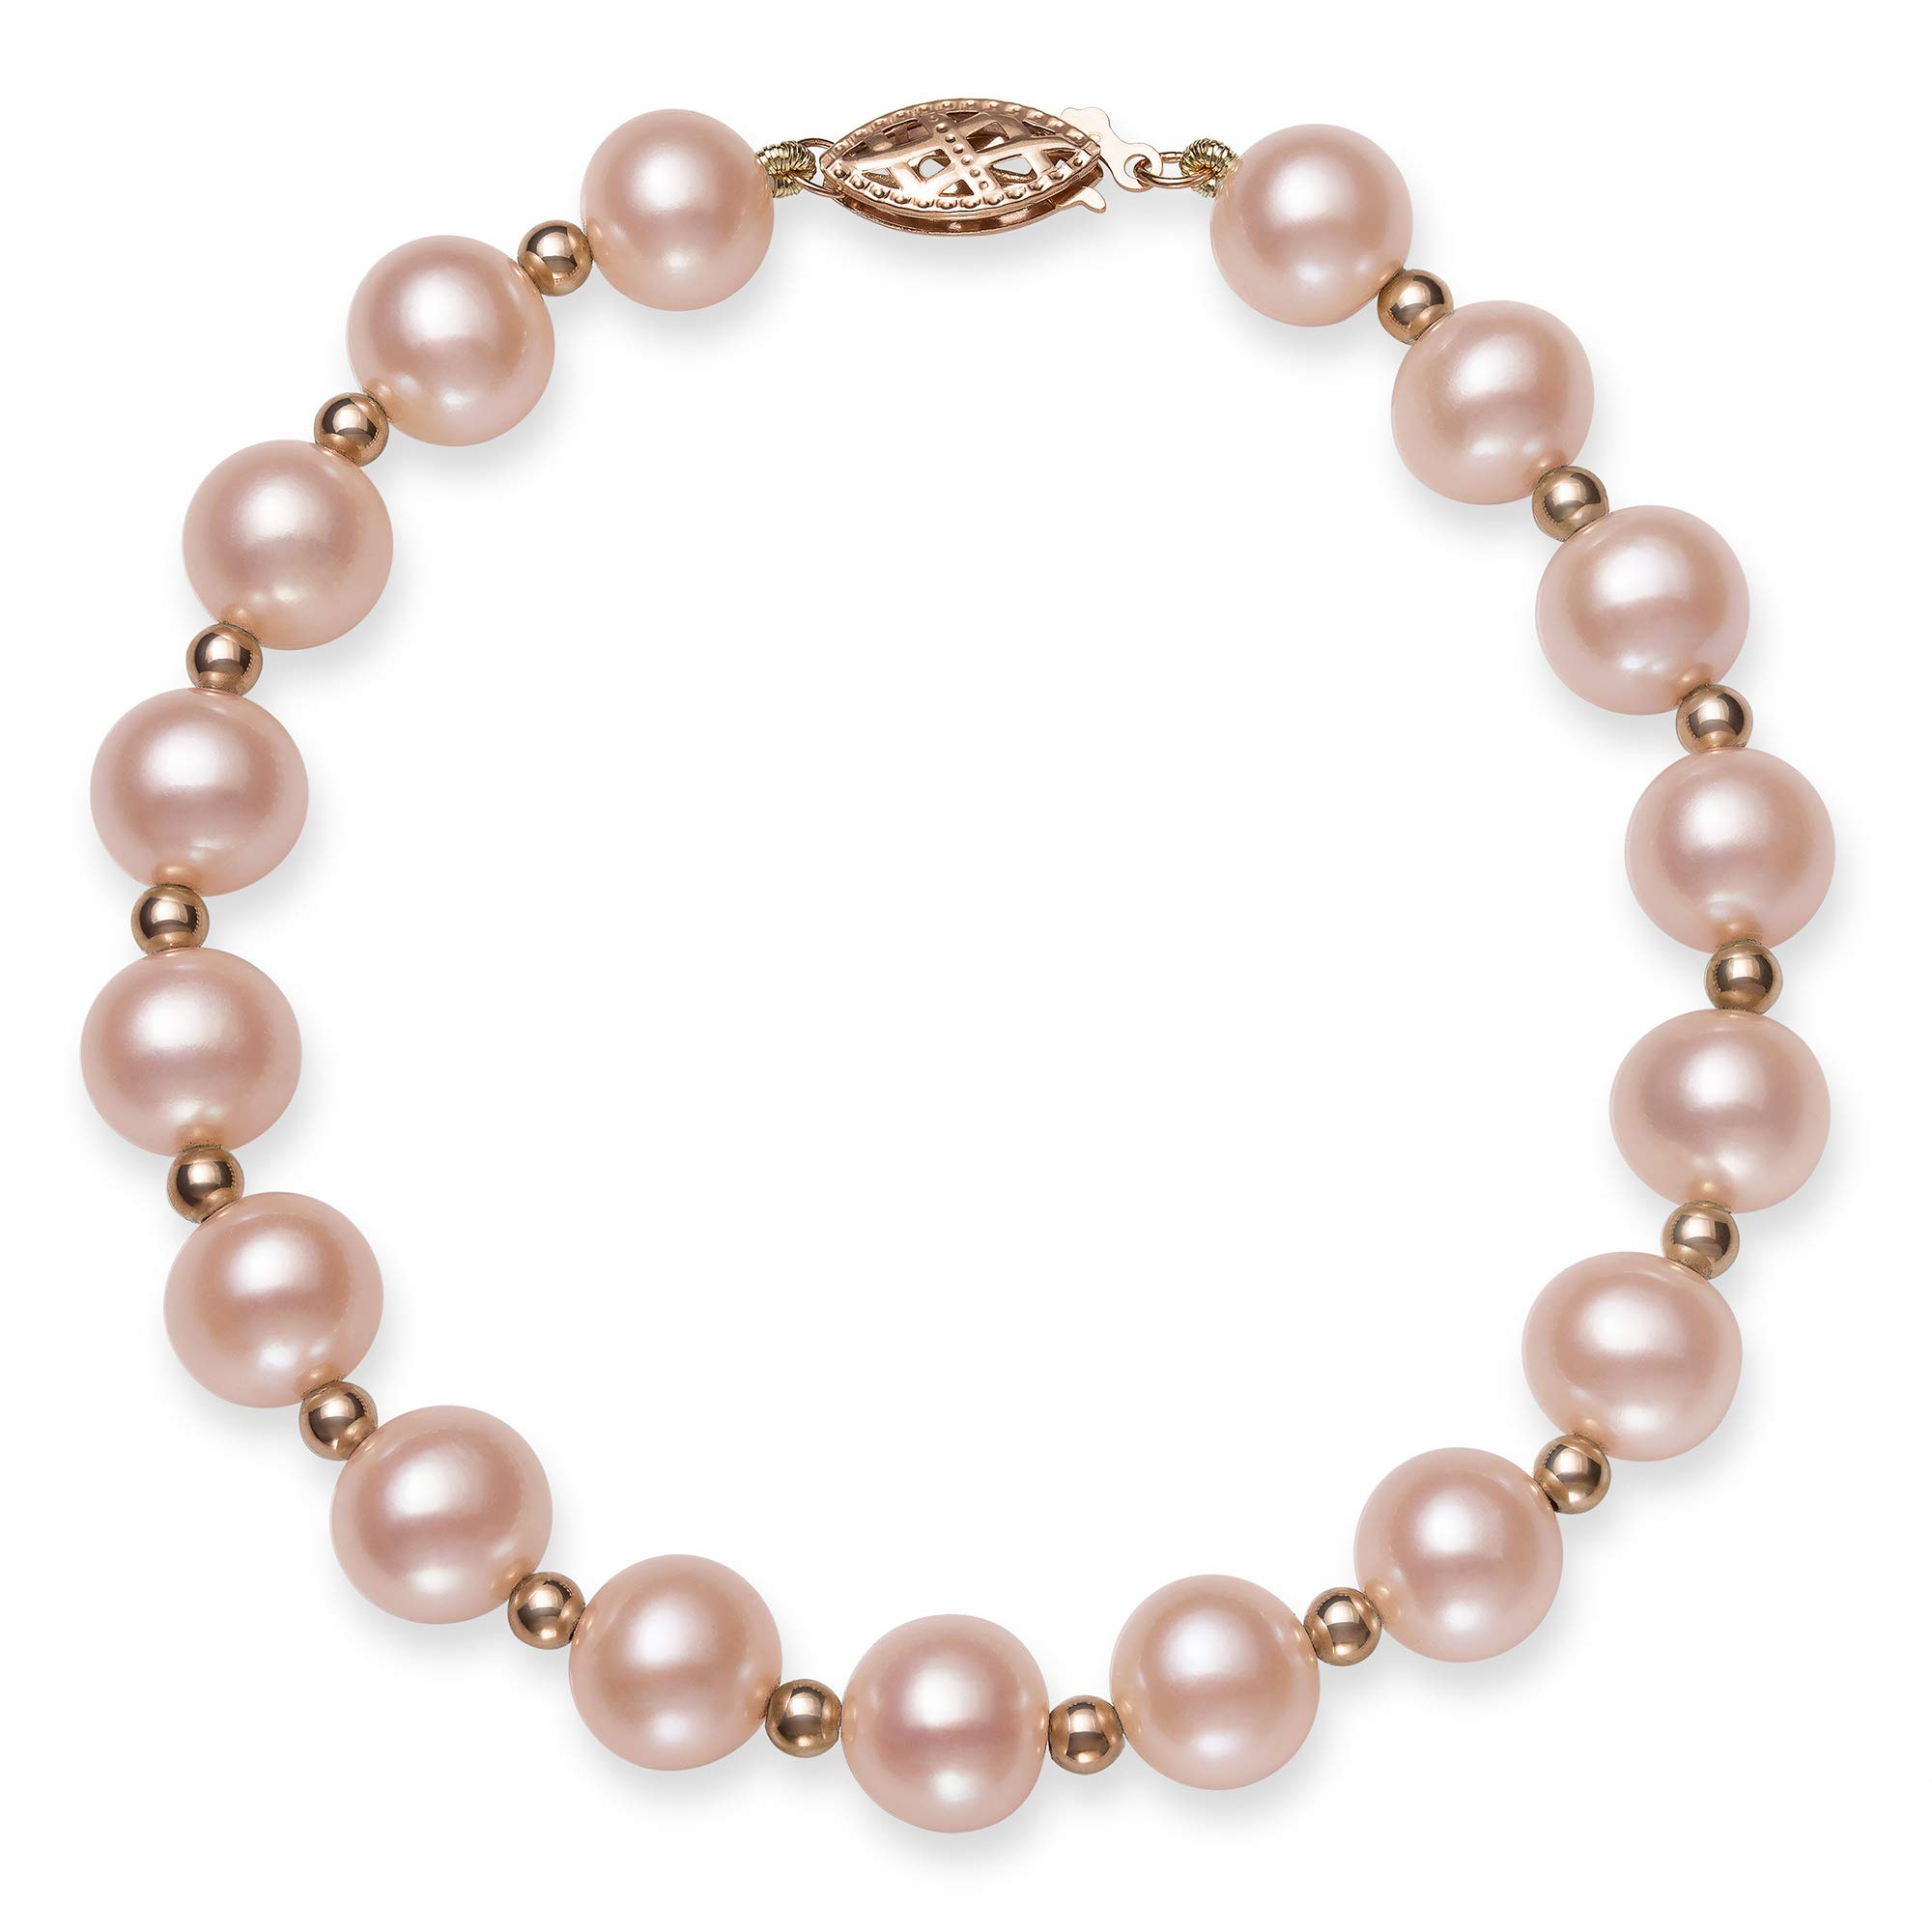 14k Rose Gold Natural Pink Cultured Freshwater Pearl Beaded Bracelet,7.5'' by Belacqua